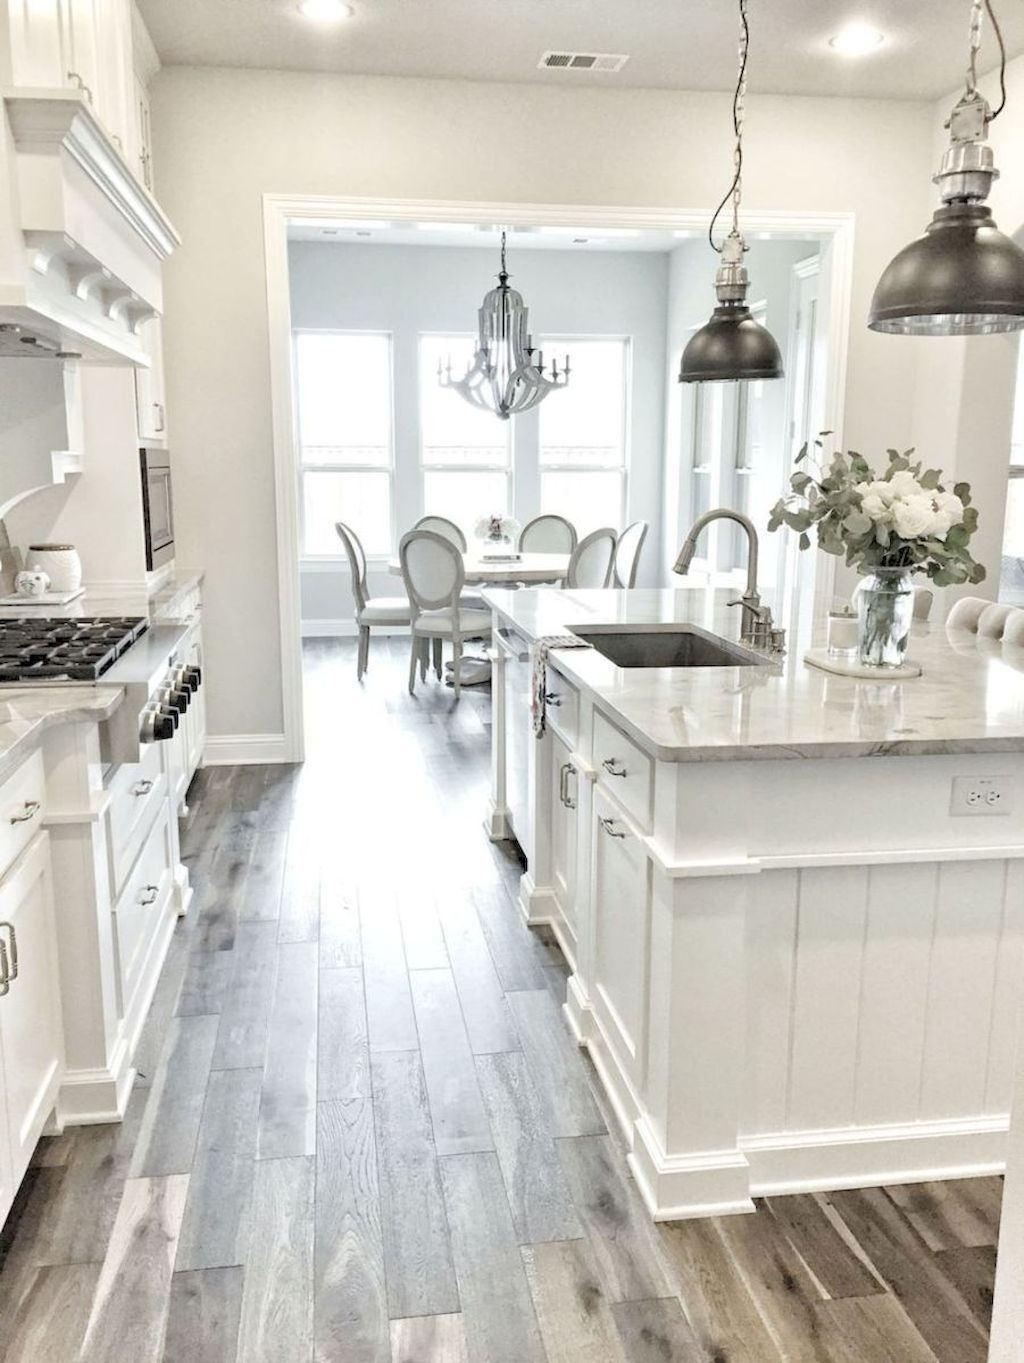 White Kitchen Cabinet Design Ideas 57 White Kitchen Design Kitchen Design Kitchen Cabinet Design